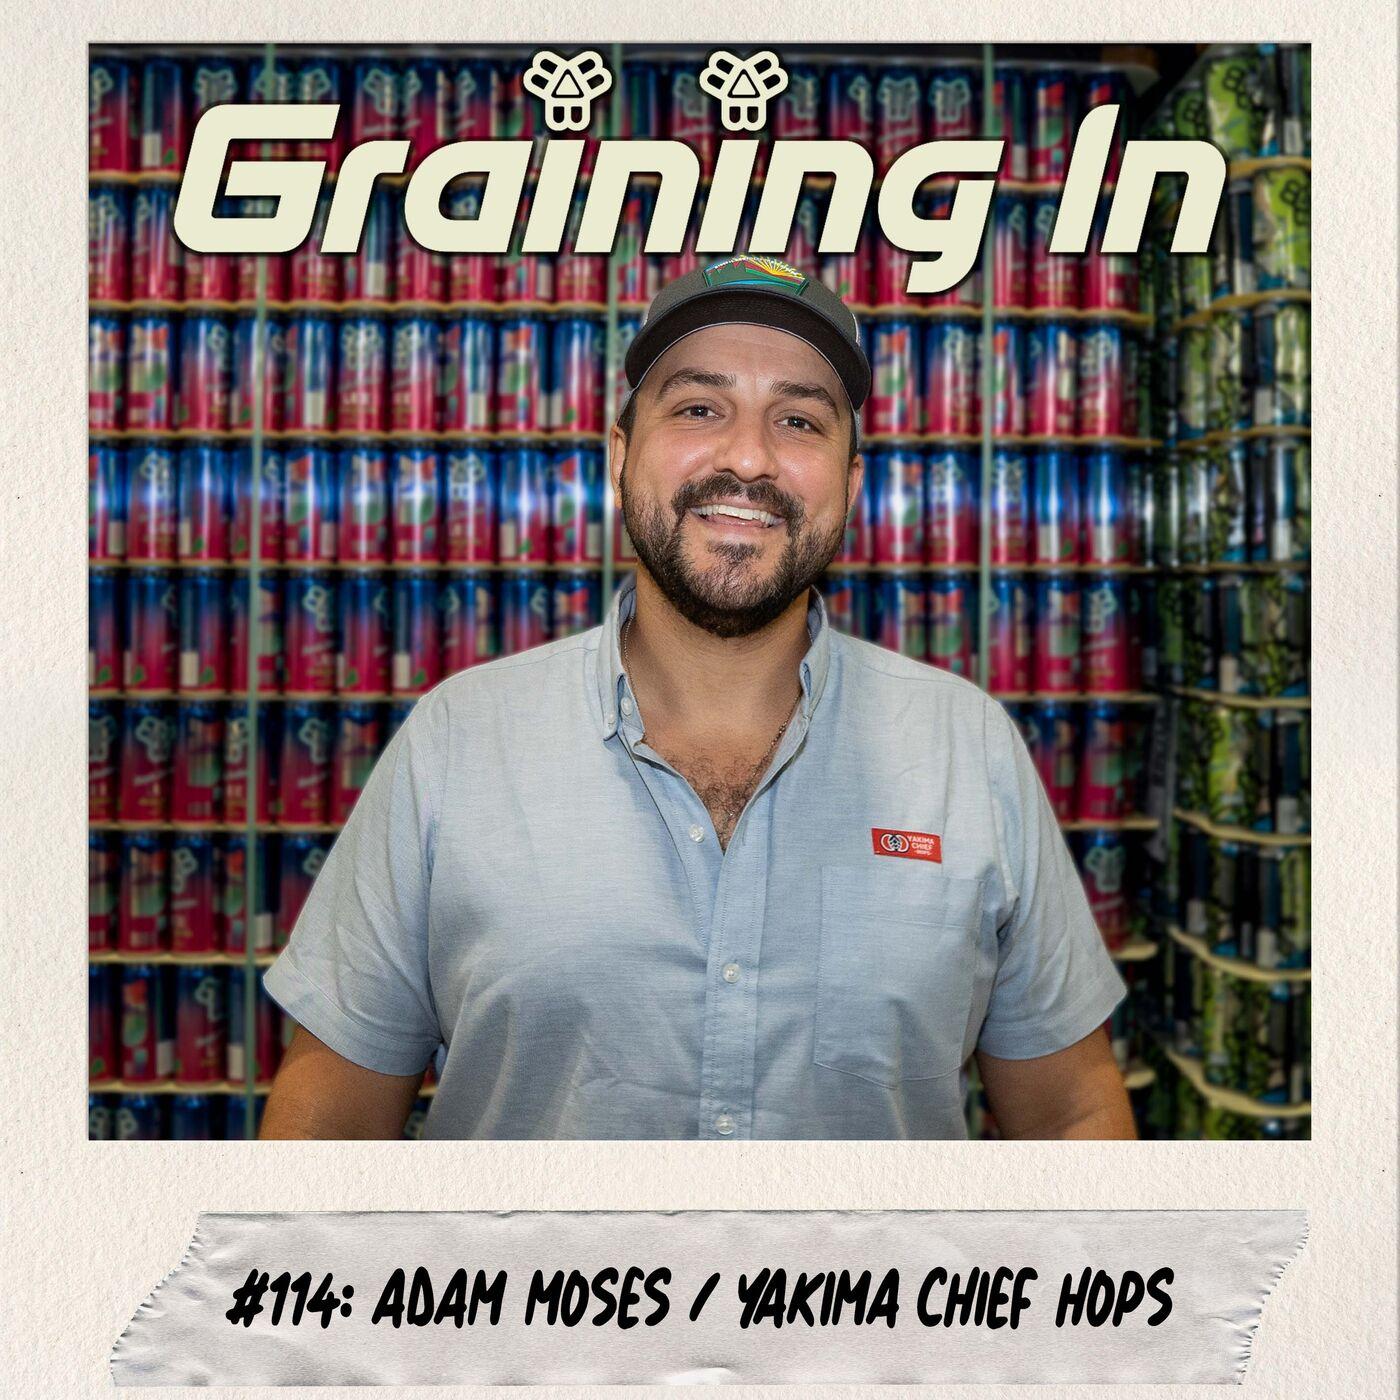 #114: Adam Moses | Yakima Chief Hops